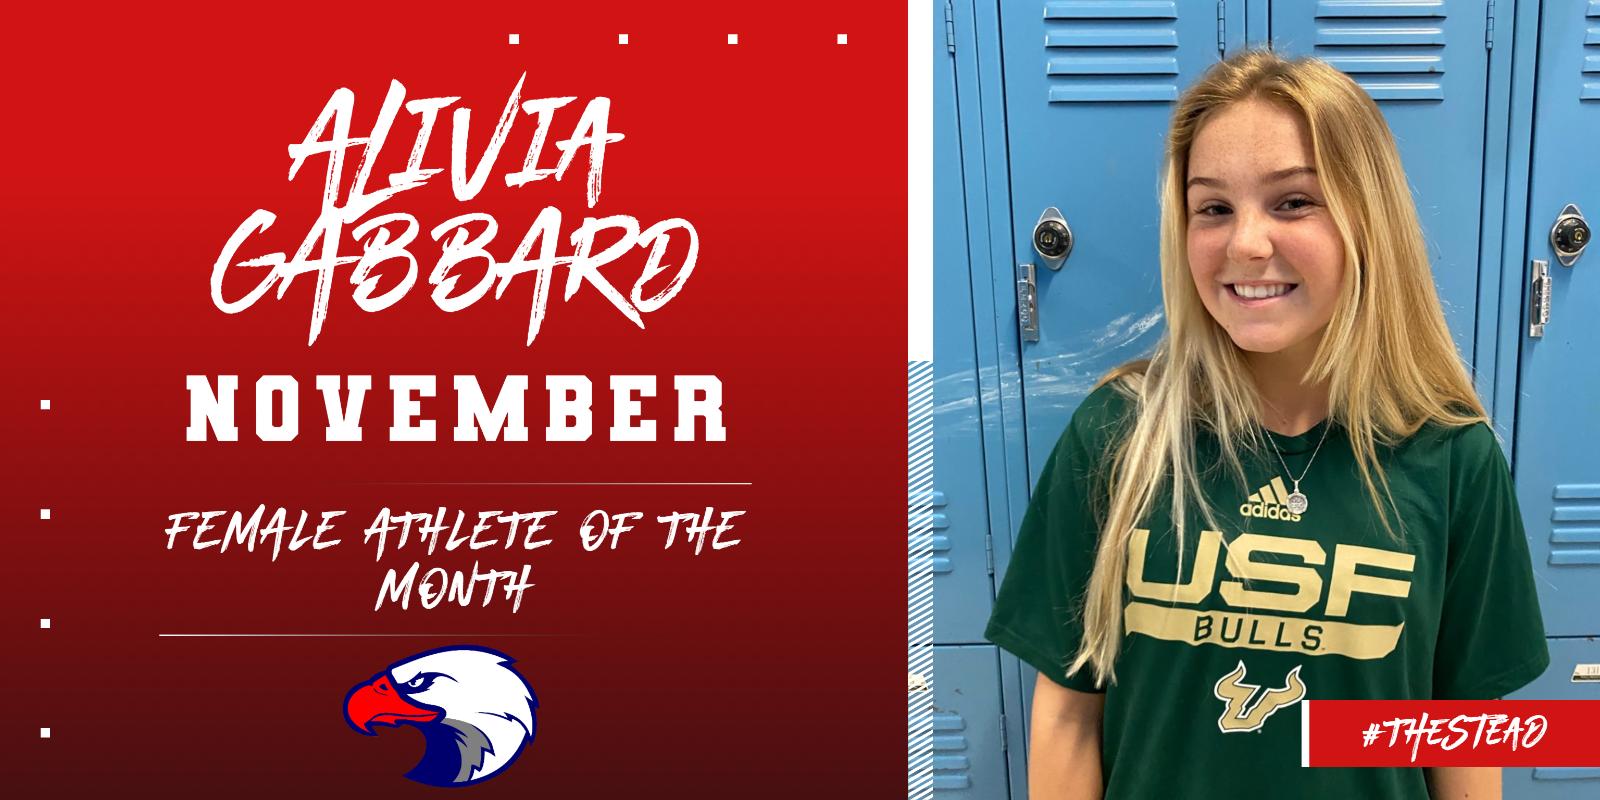 Alivia Gabbard – November Female Athlete of the Month